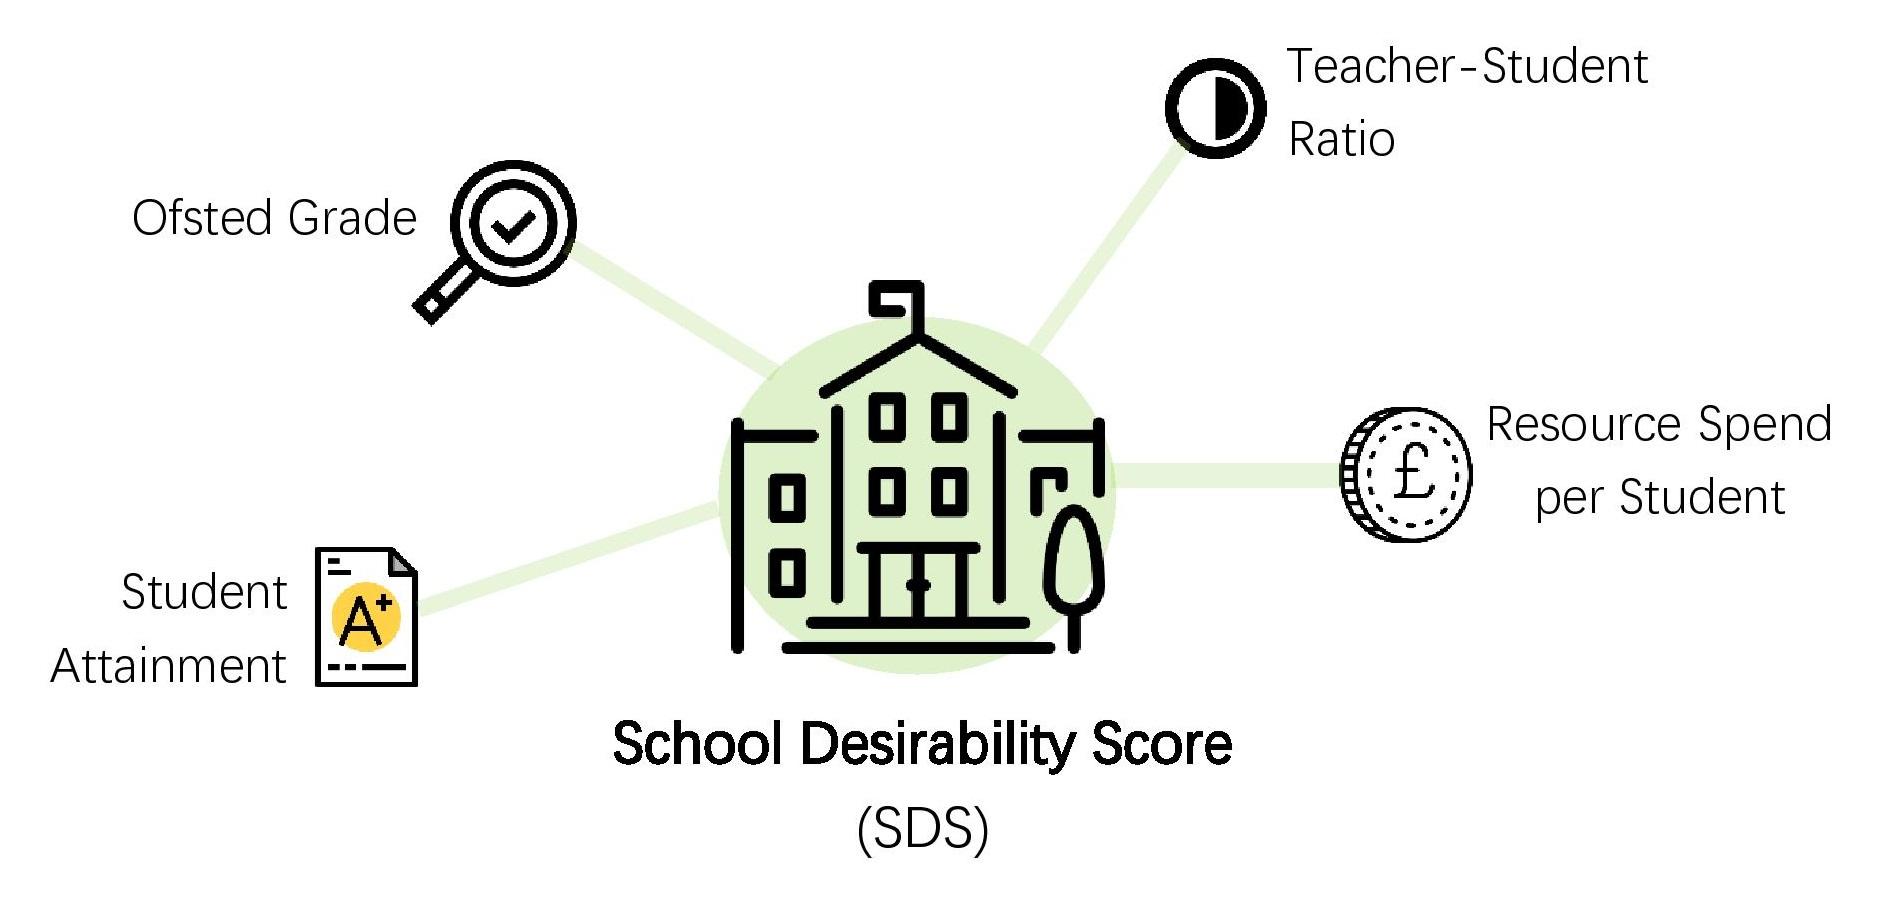 School Desirability Score (SDC)